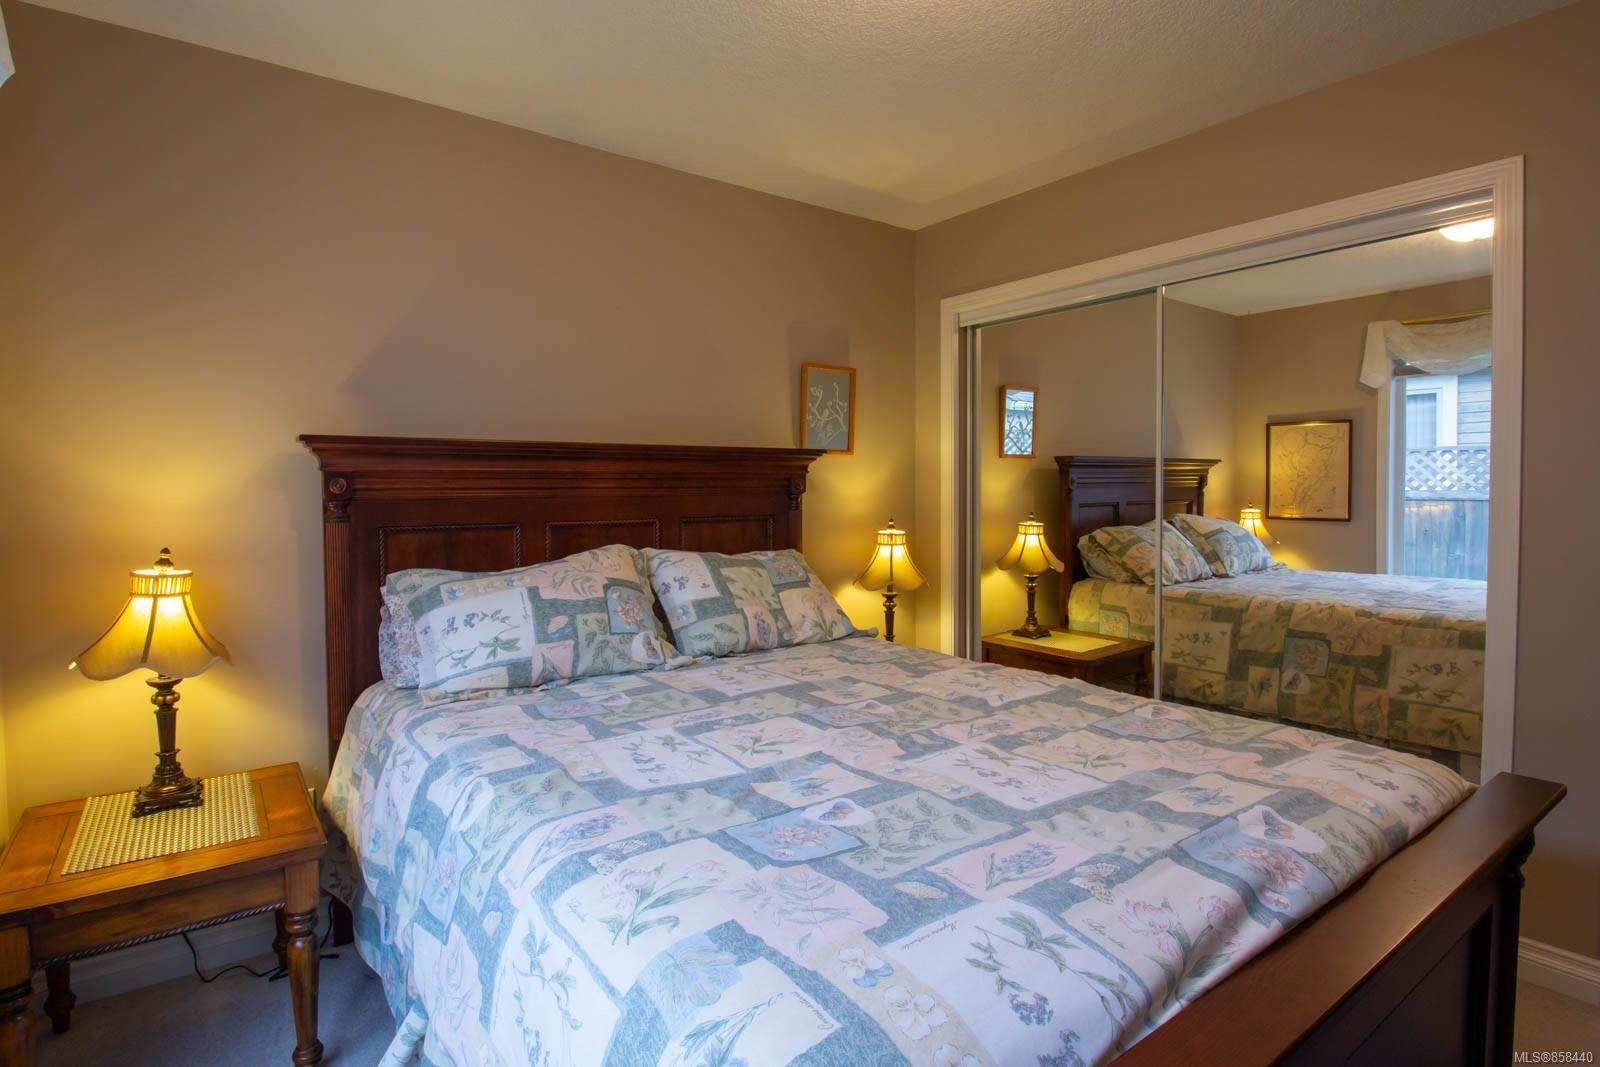 Photo 8: Photos: 798 Devon Pl in : PQ Qualicum Beach House for sale (Parksville/Qualicum)  : MLS®# 858440